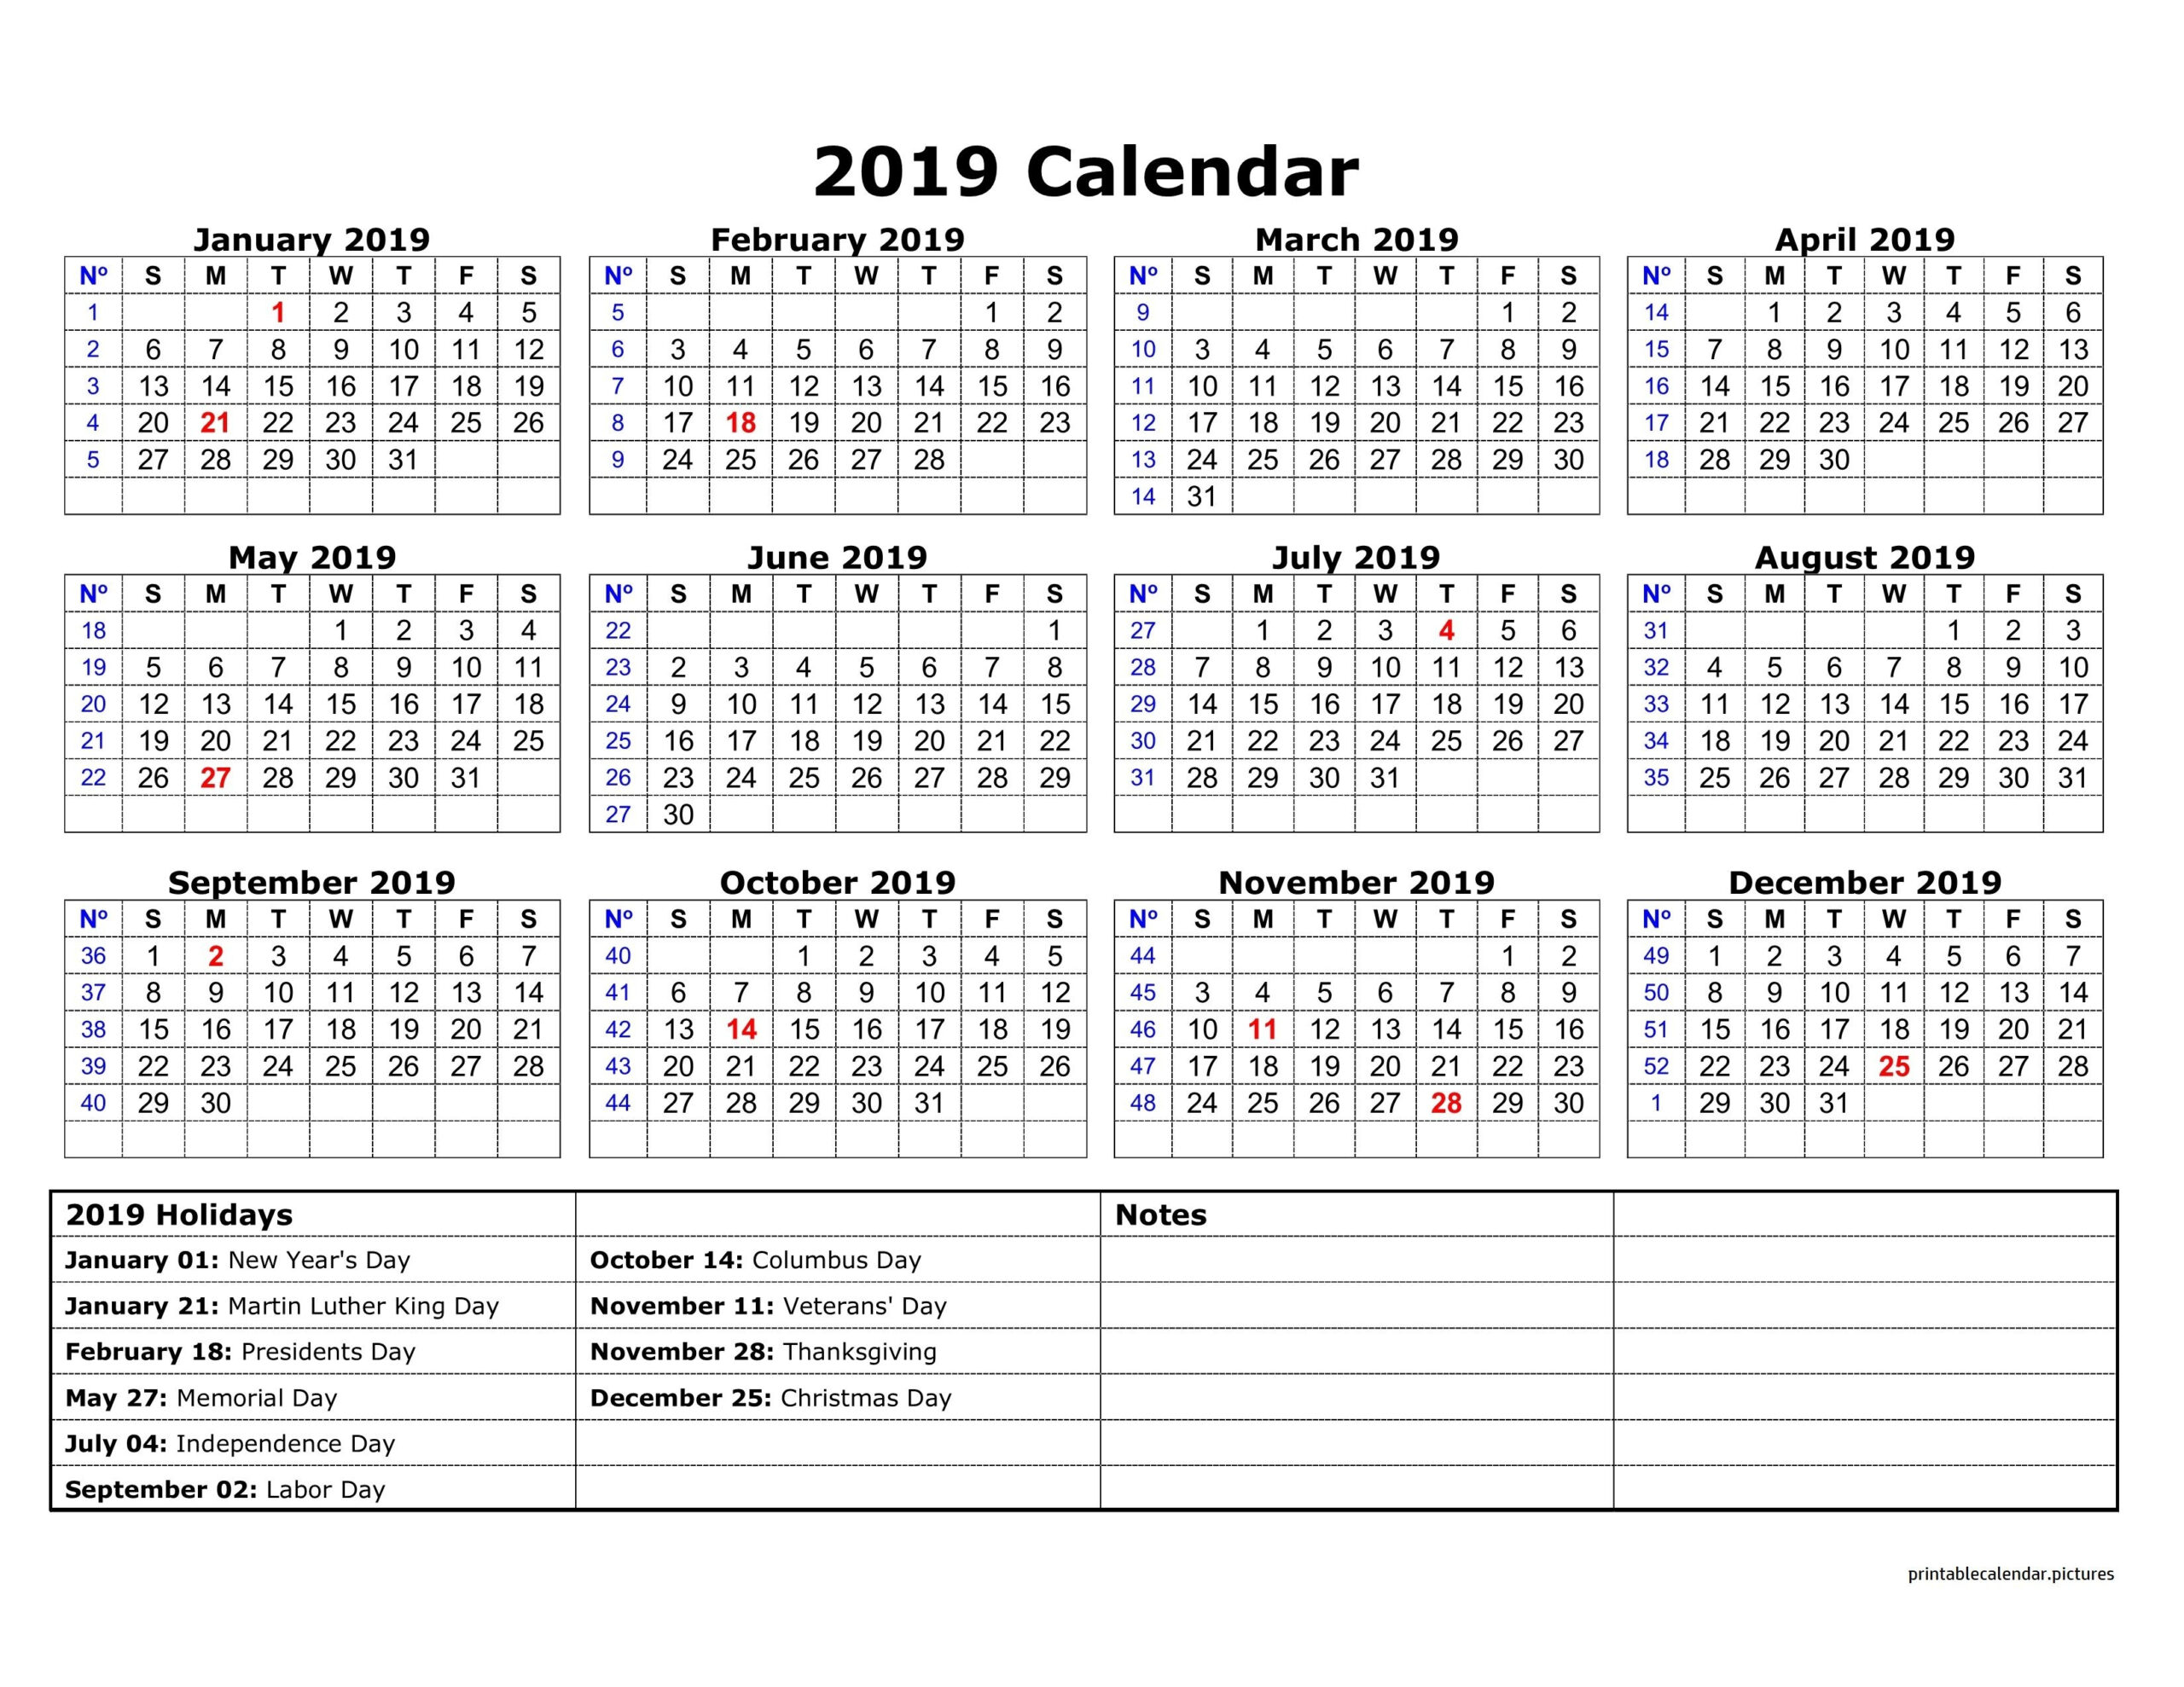 Australian Calendar 2019 Printable   Qualads within Important Awarness Dates 2021 Australia